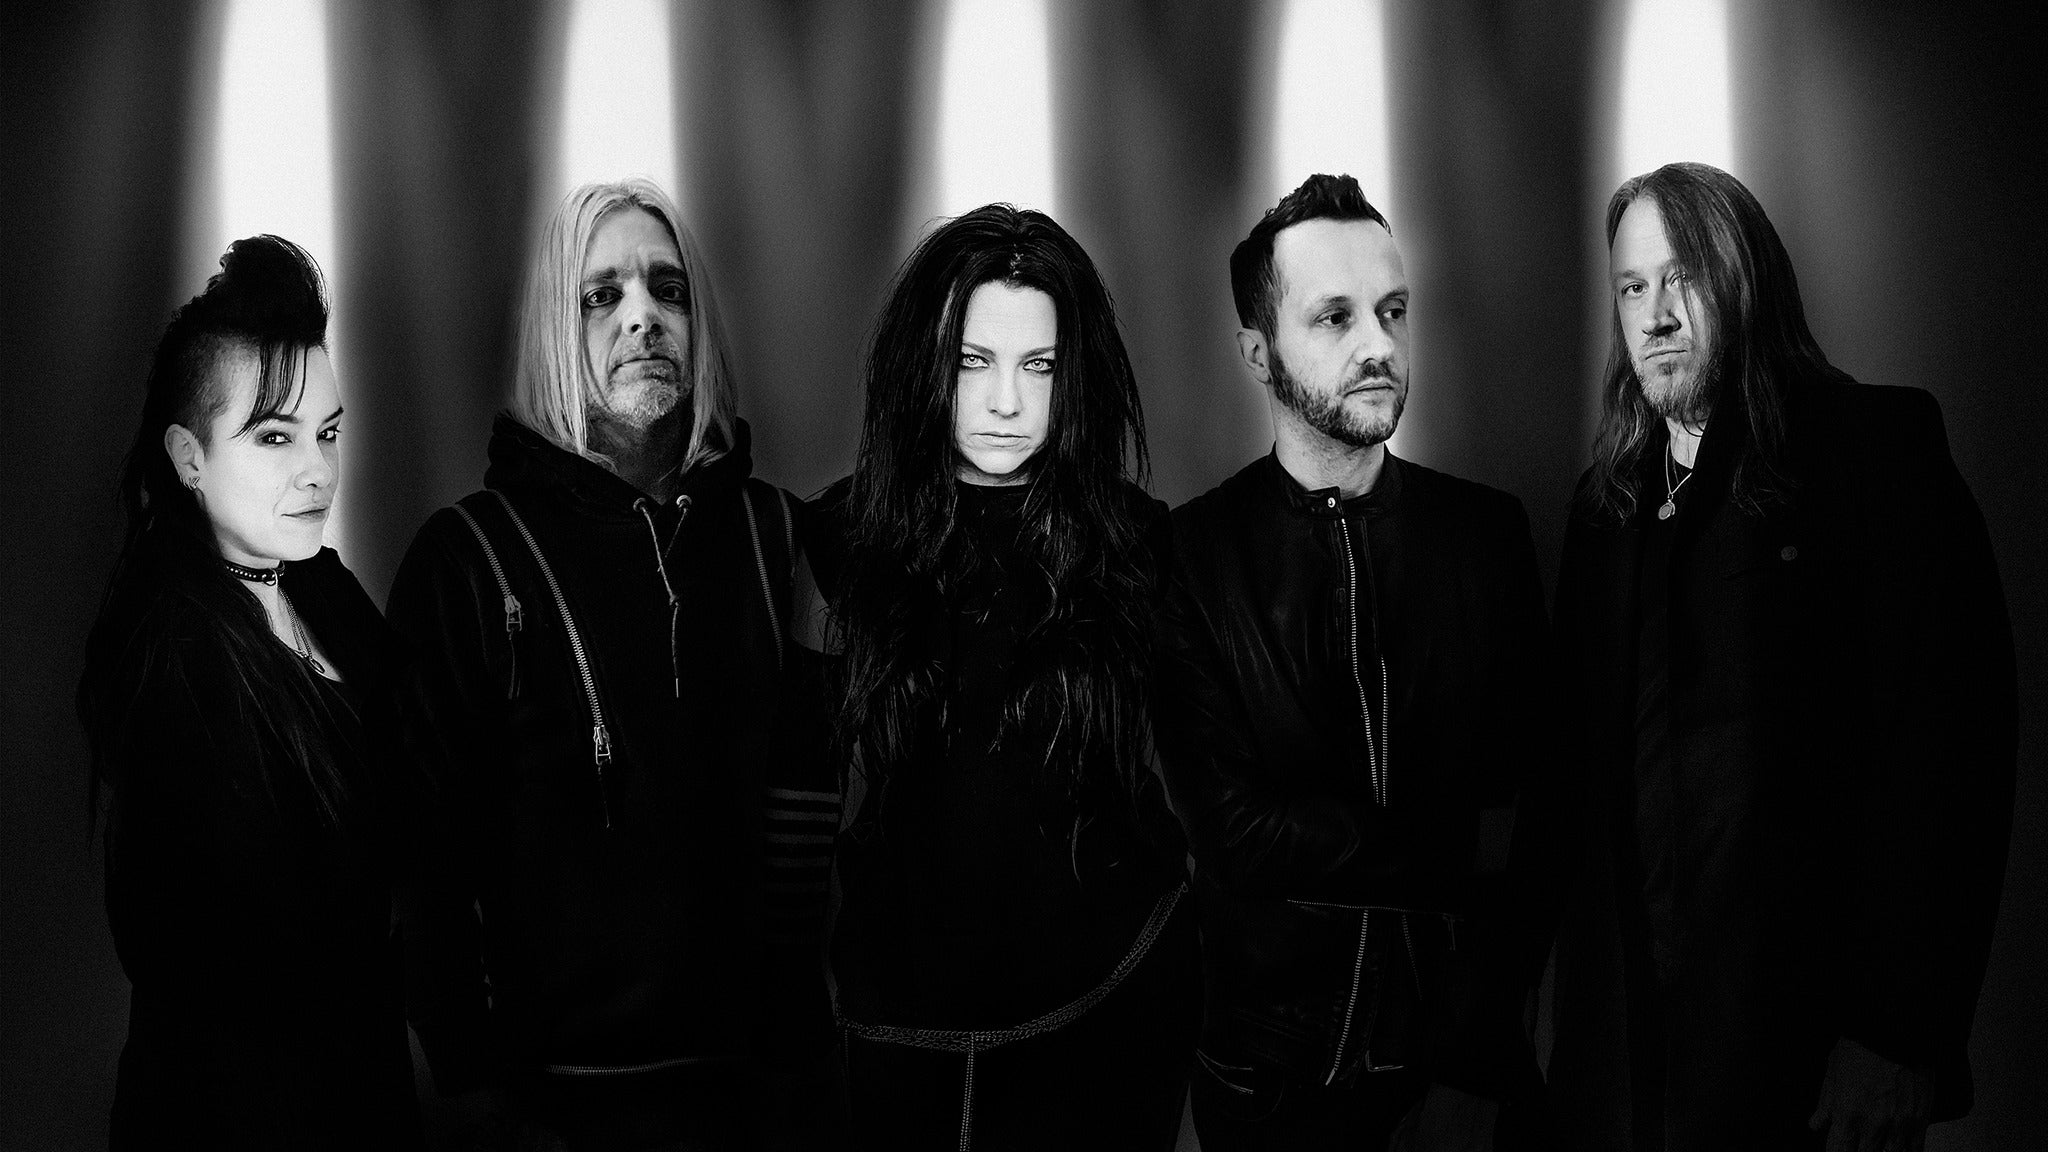 Evanescence + Halestorm pre-sale password for event tickets in Nashville, TN (Bridgestone Arena)